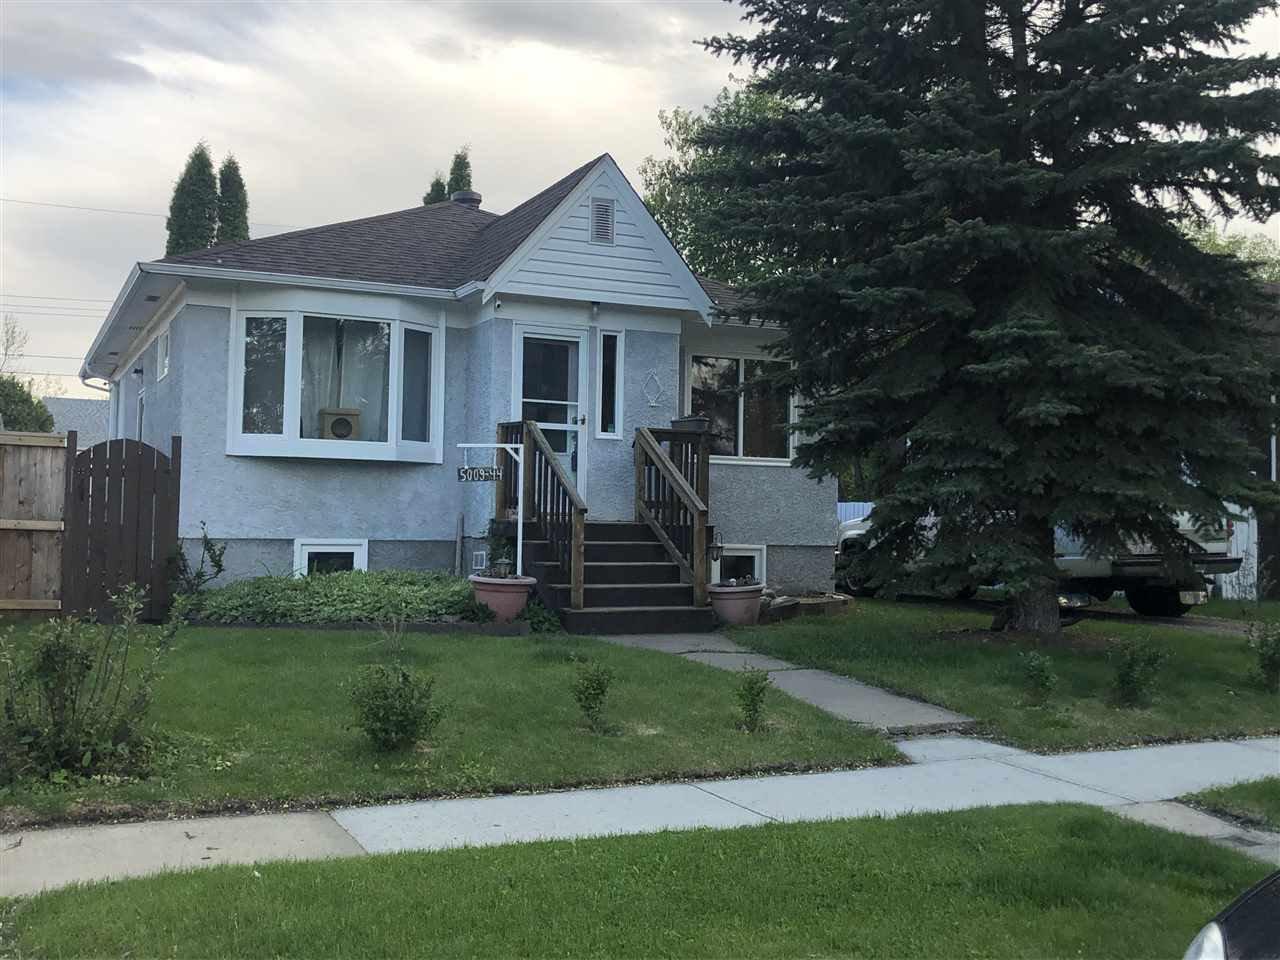 Main Photo: 5009 44 Avenue: Wetaskiwin House for sale : MLS®# E4179796